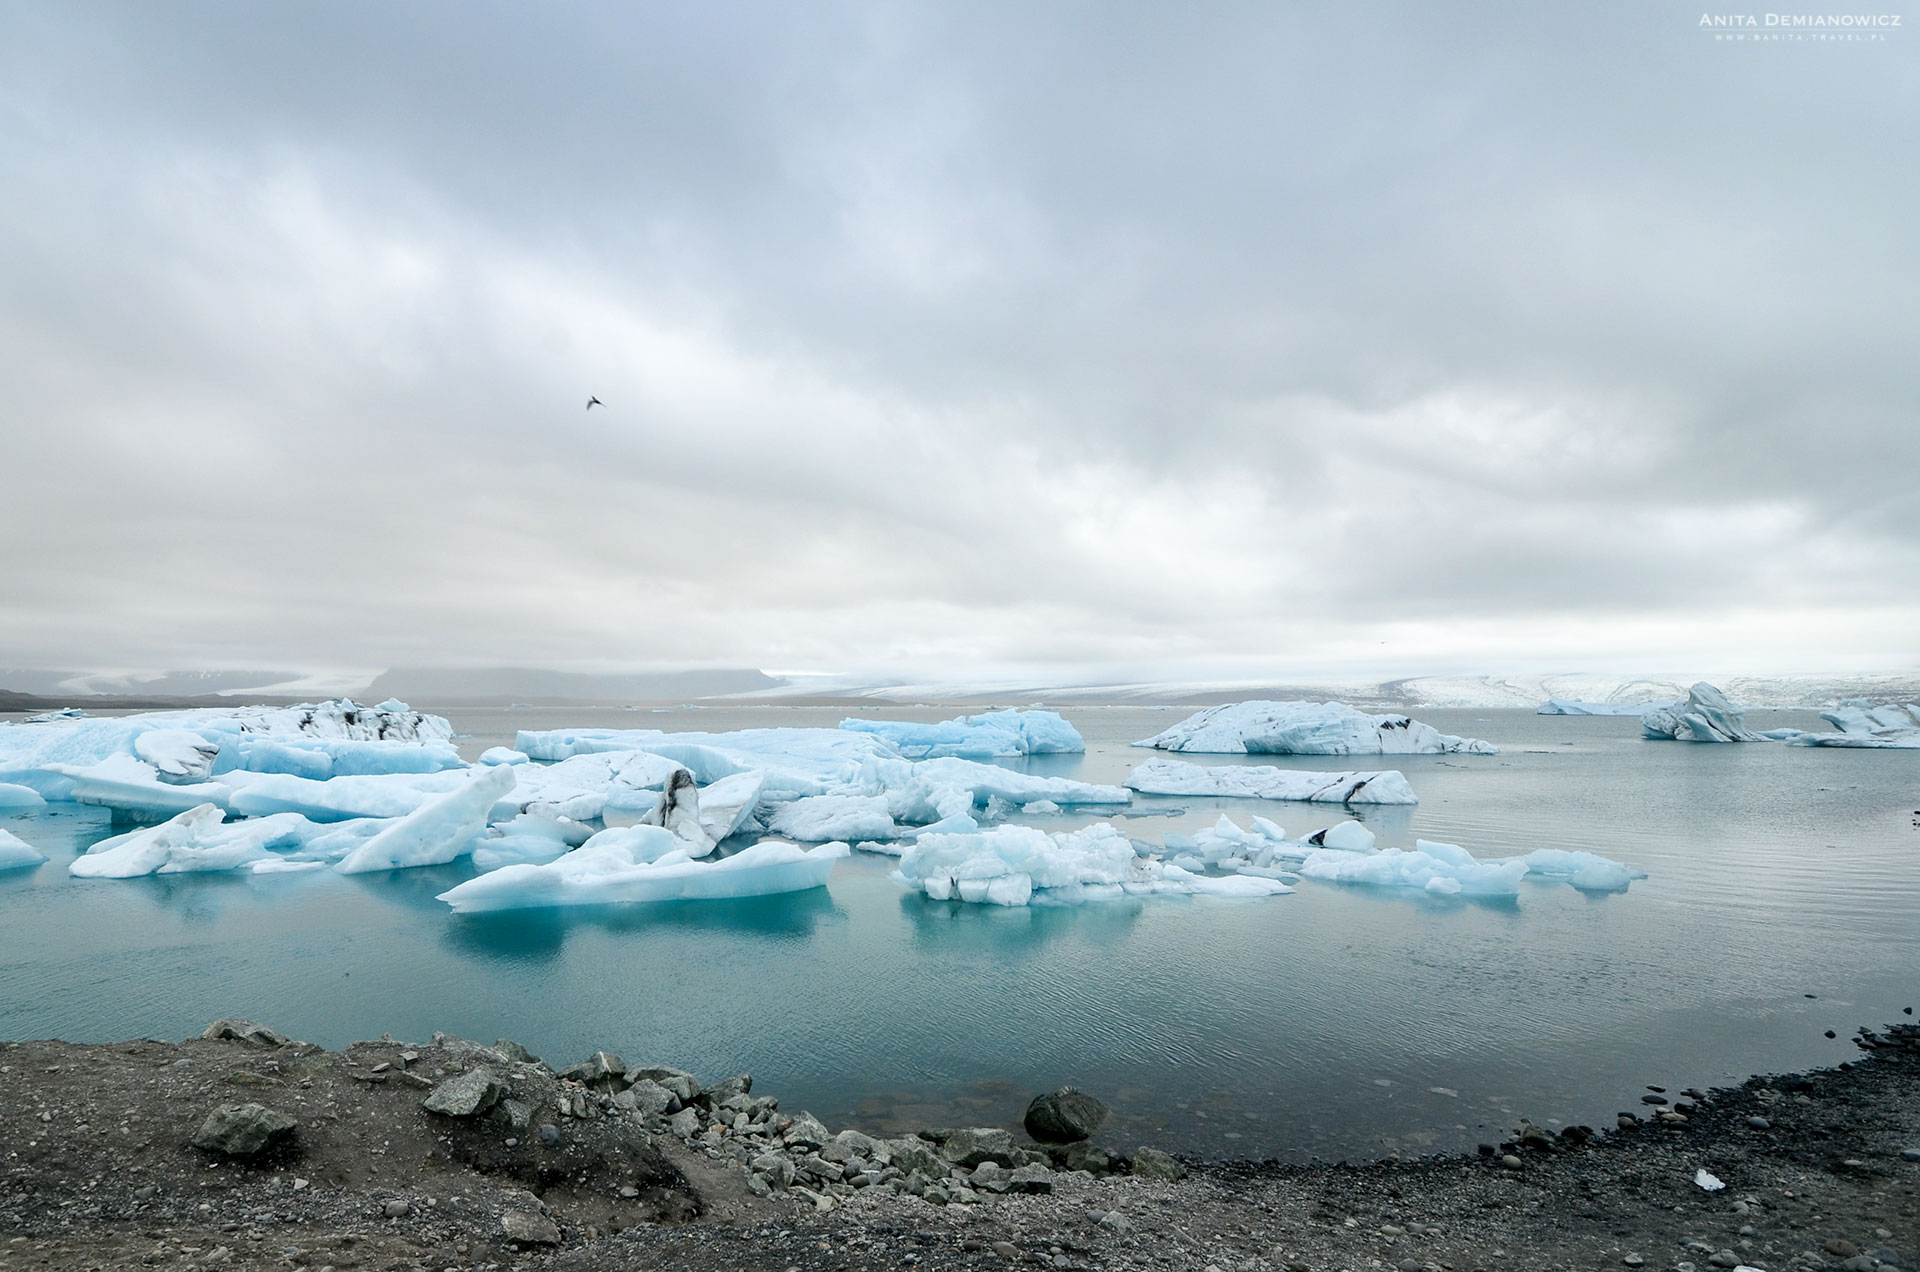 Zatoka-lodowcowa,-Jokulsarlon,--Islandia,-Anita-Demianowicz